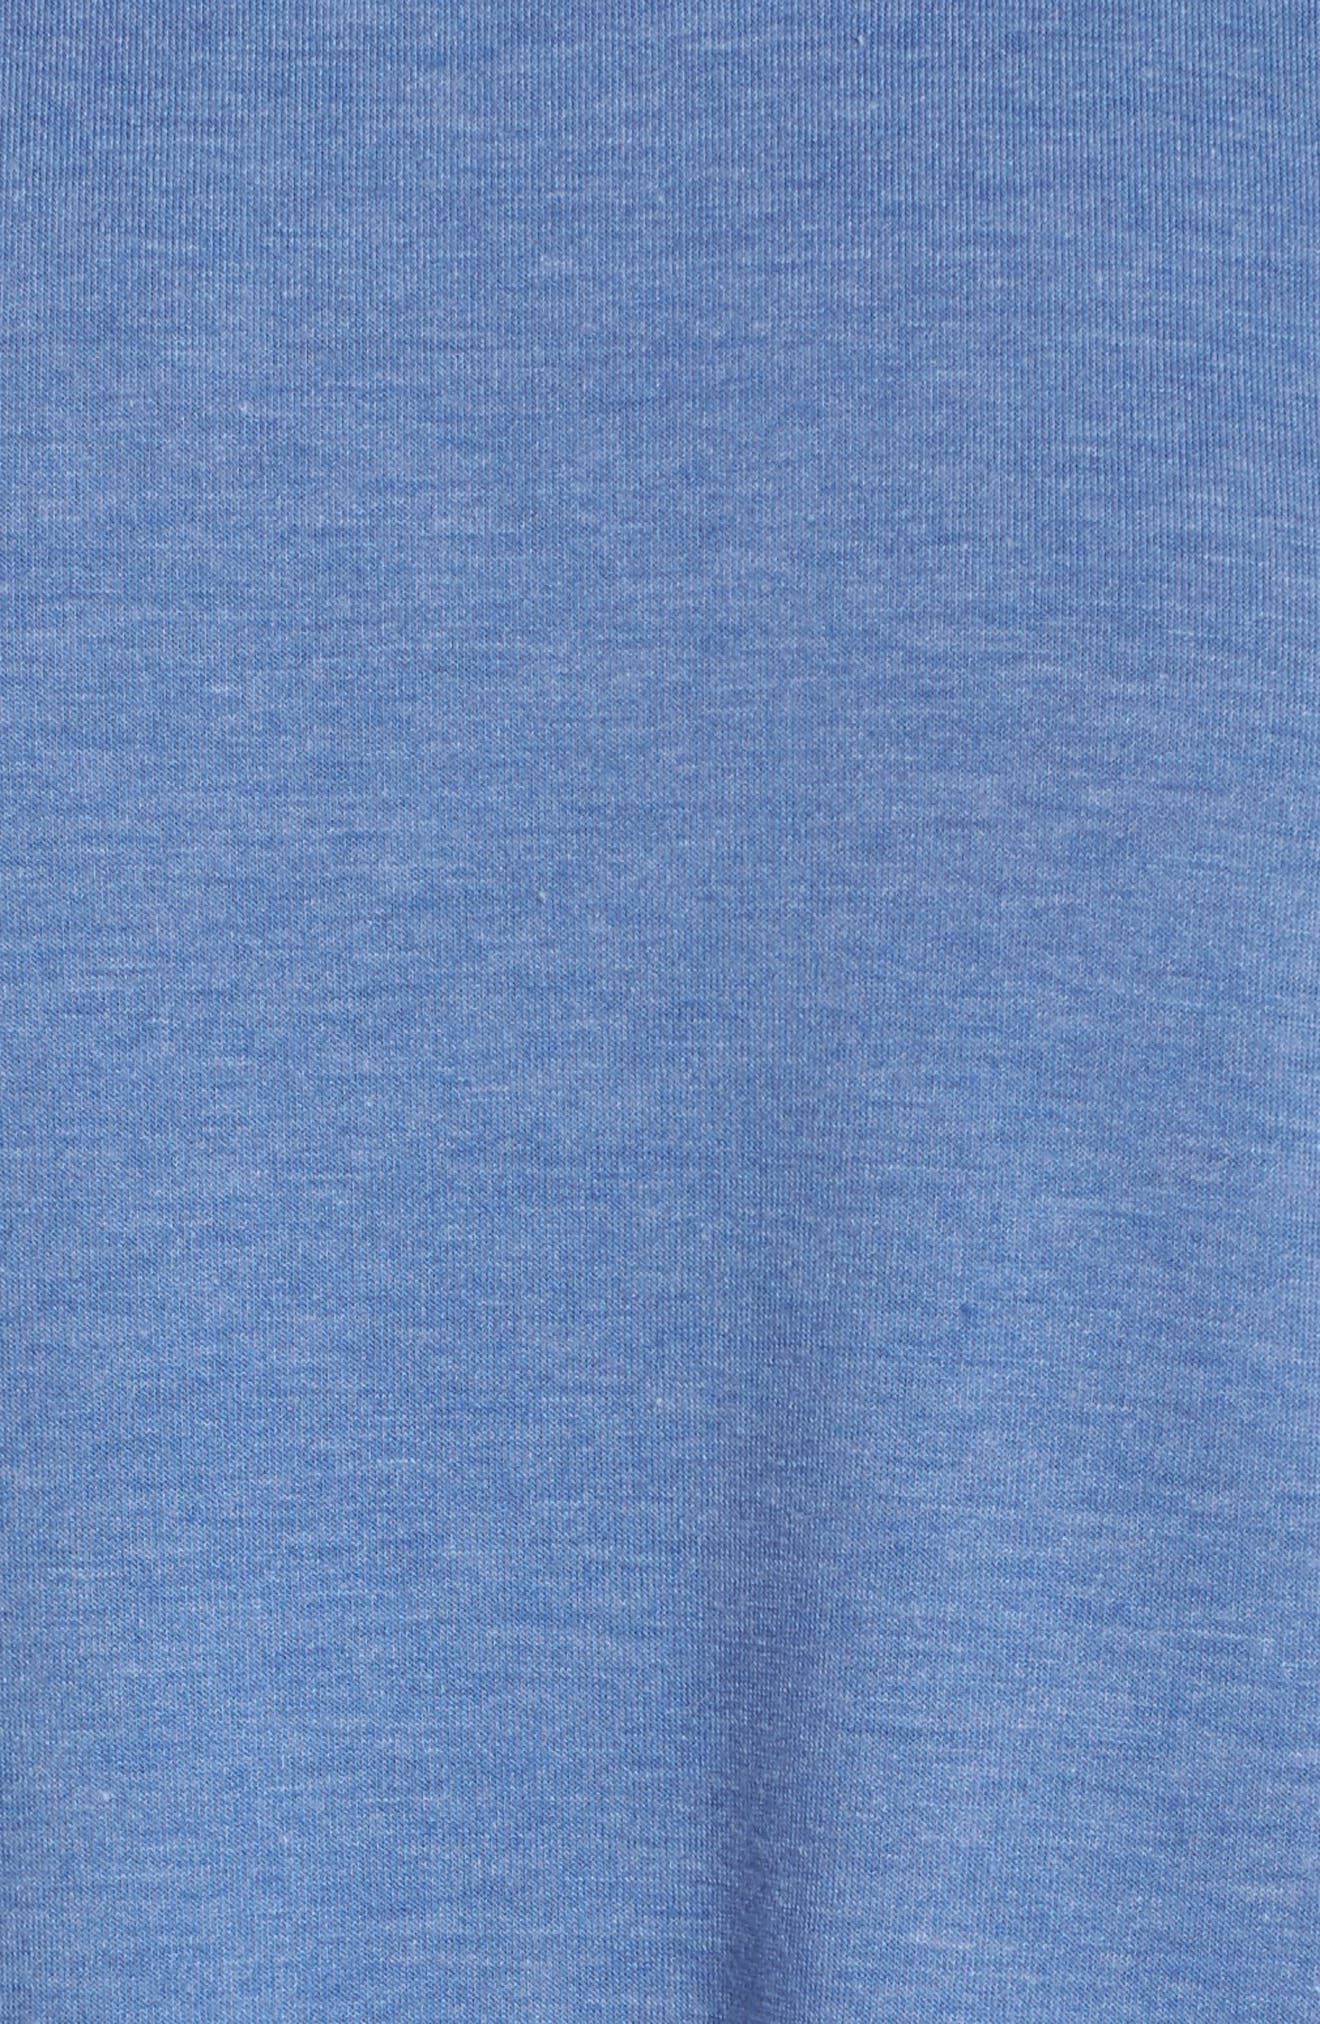 Honeydew All American Sleep Shirt,                             Alternate thumbnail 31, color,